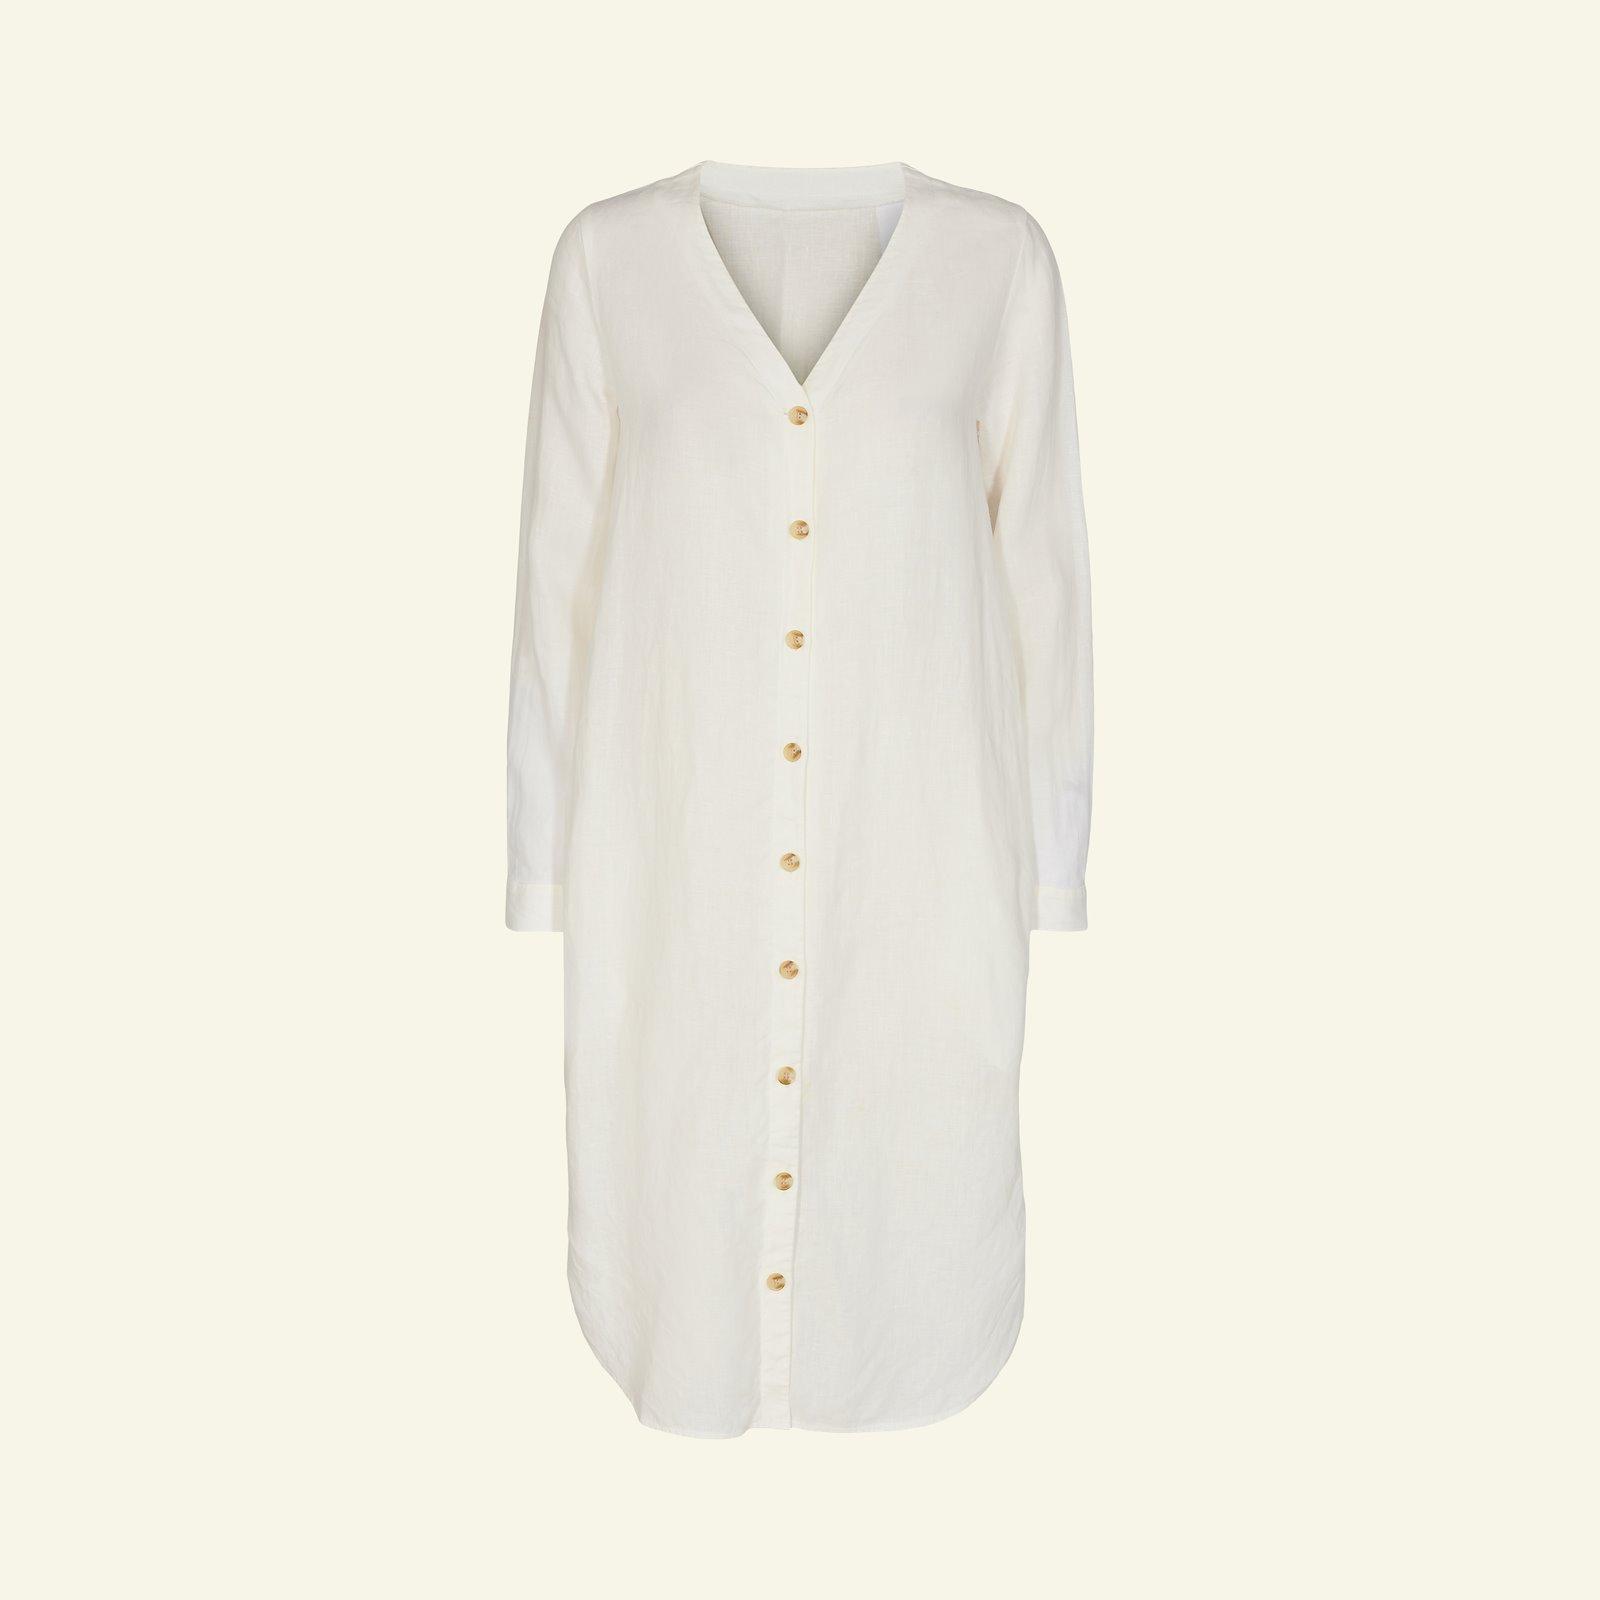 Shirtdress, 46/18 p23123_850490_sskit